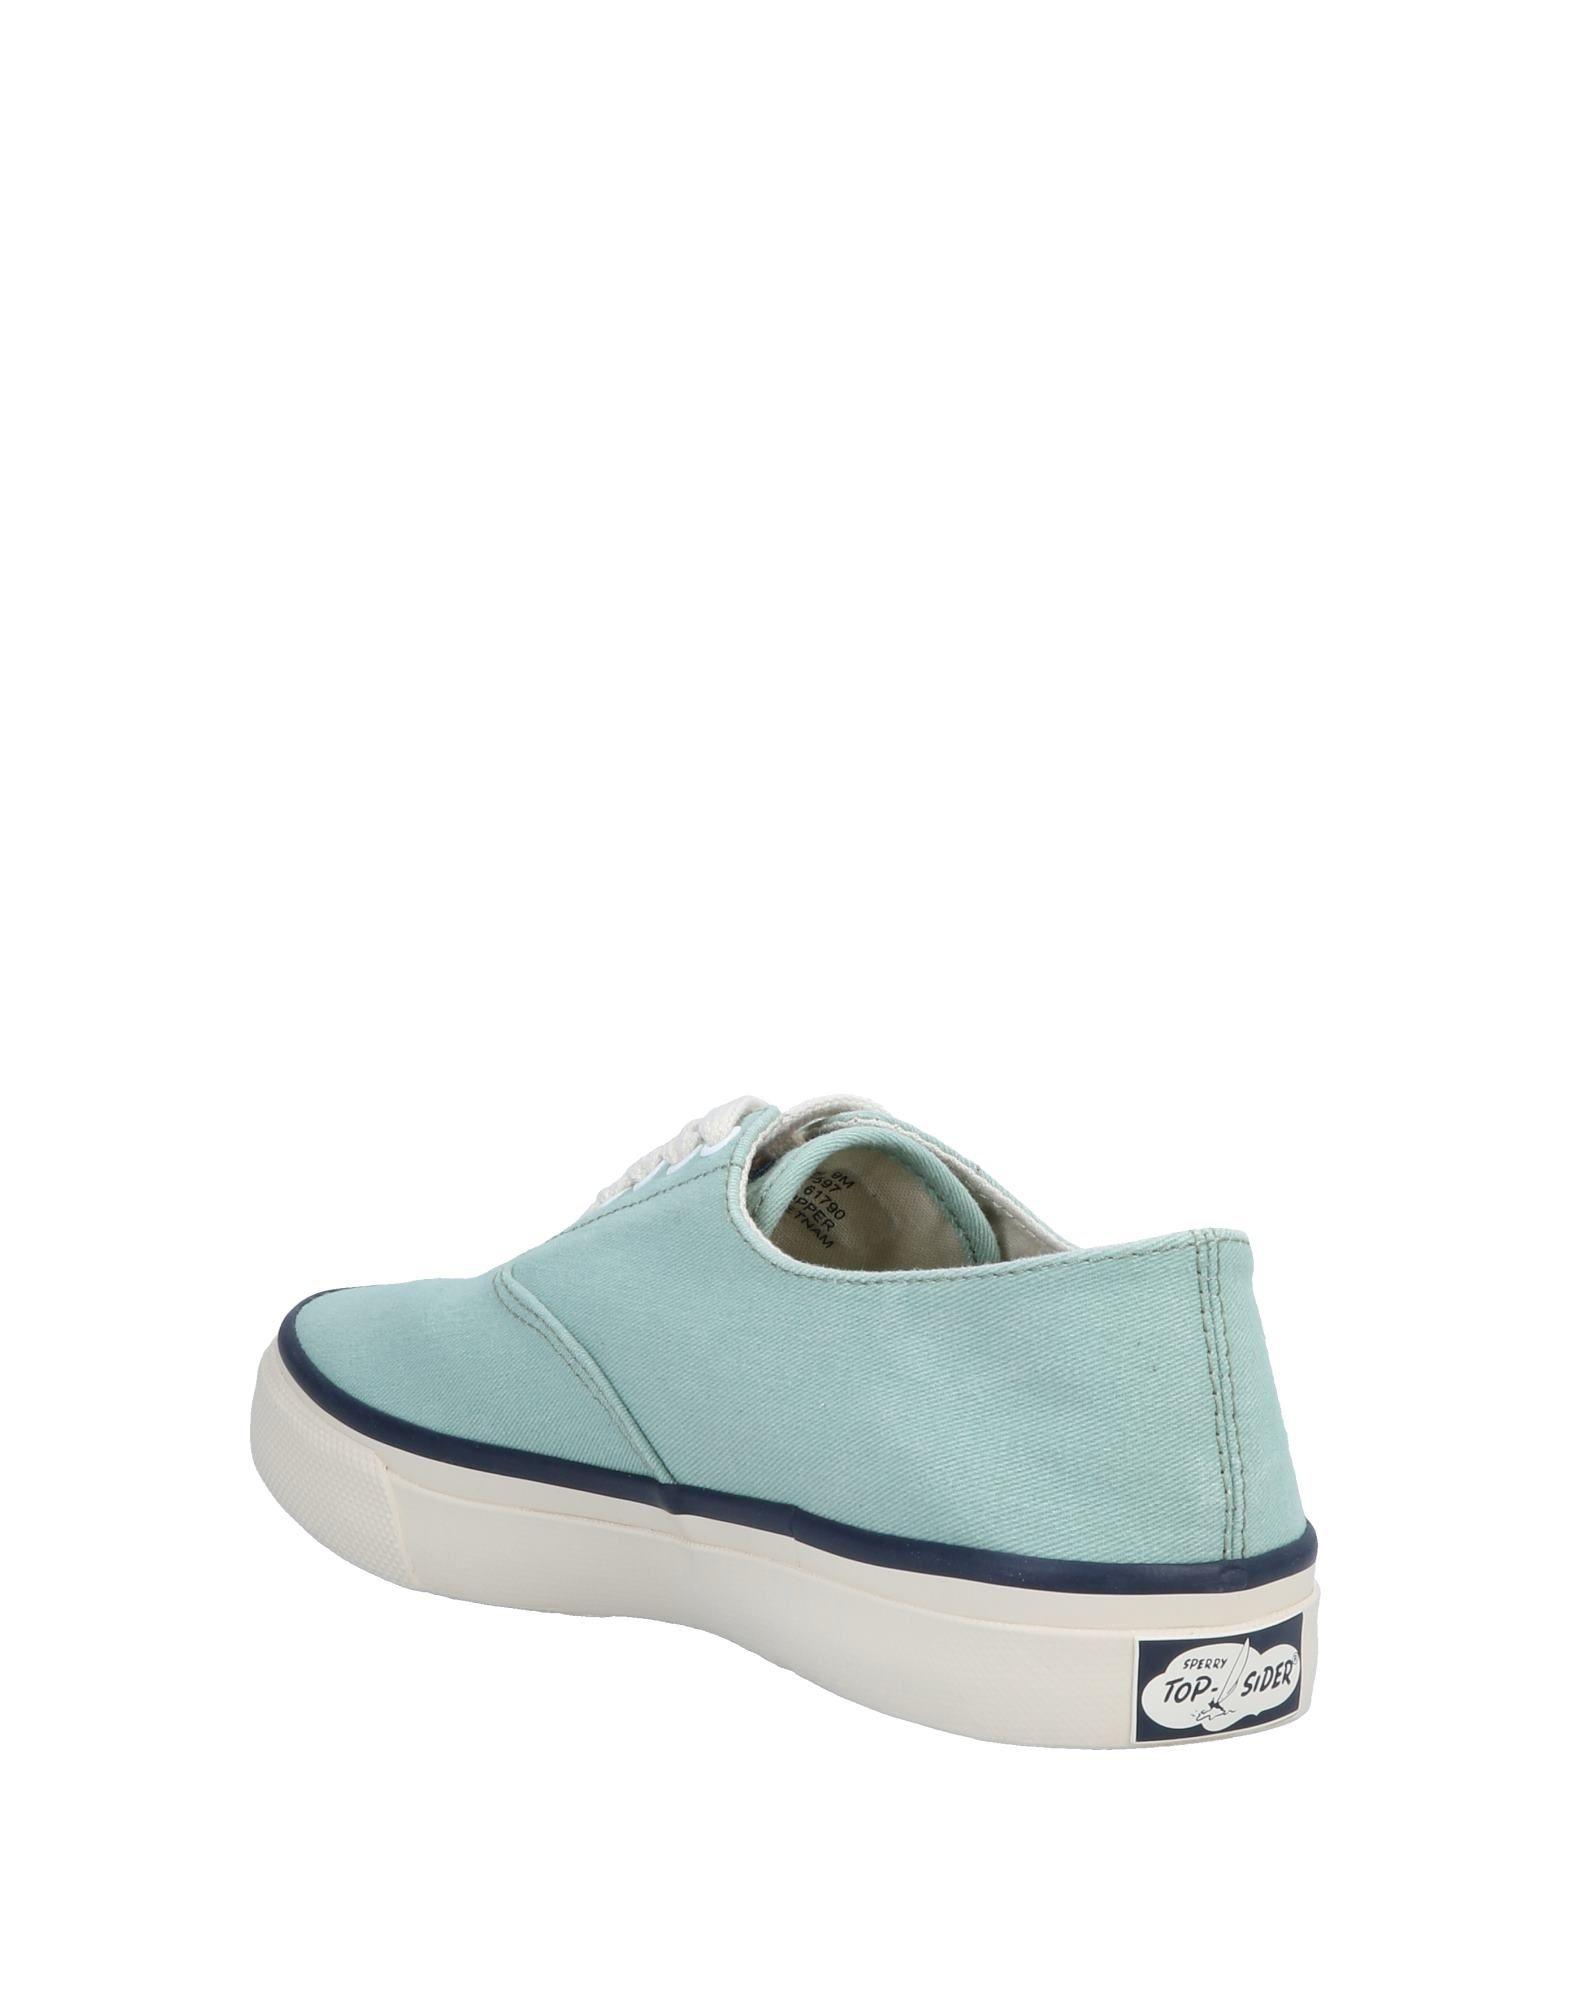 Sperry Top-Sider Sneakers - Men Sperry Top-Sider Sneakers online online online on  Australia - 11570650NO c04836